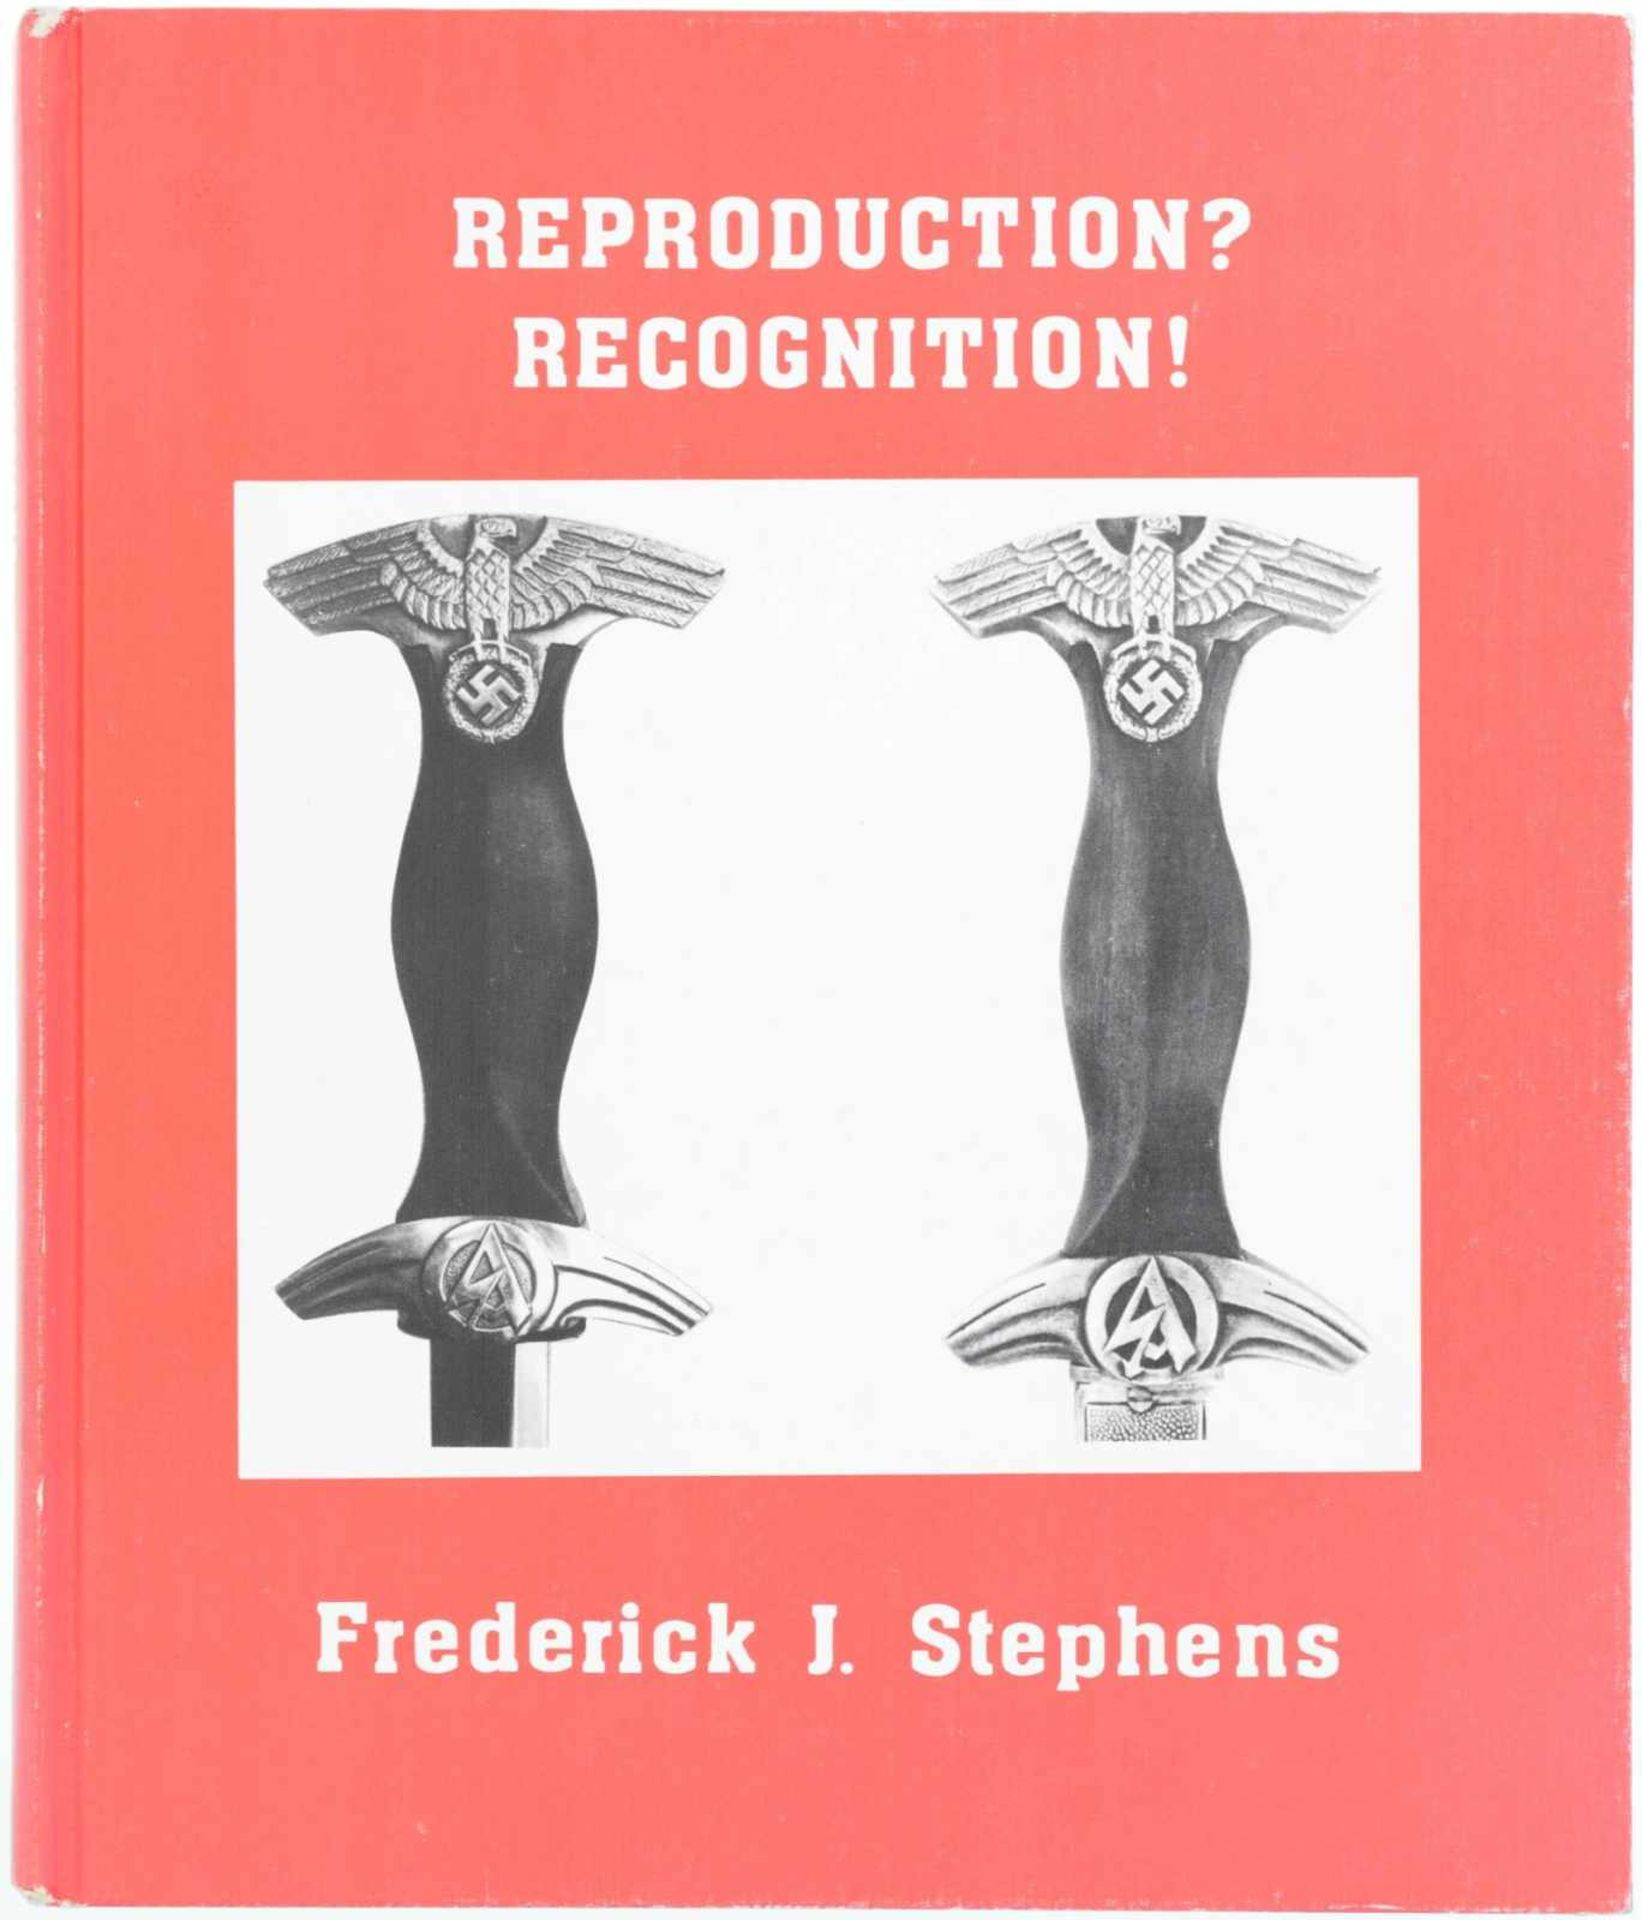 Reproduction ? Recognition !@ Autor Frederick J. Stephens, 1981, 247 S. illust. Werk zur